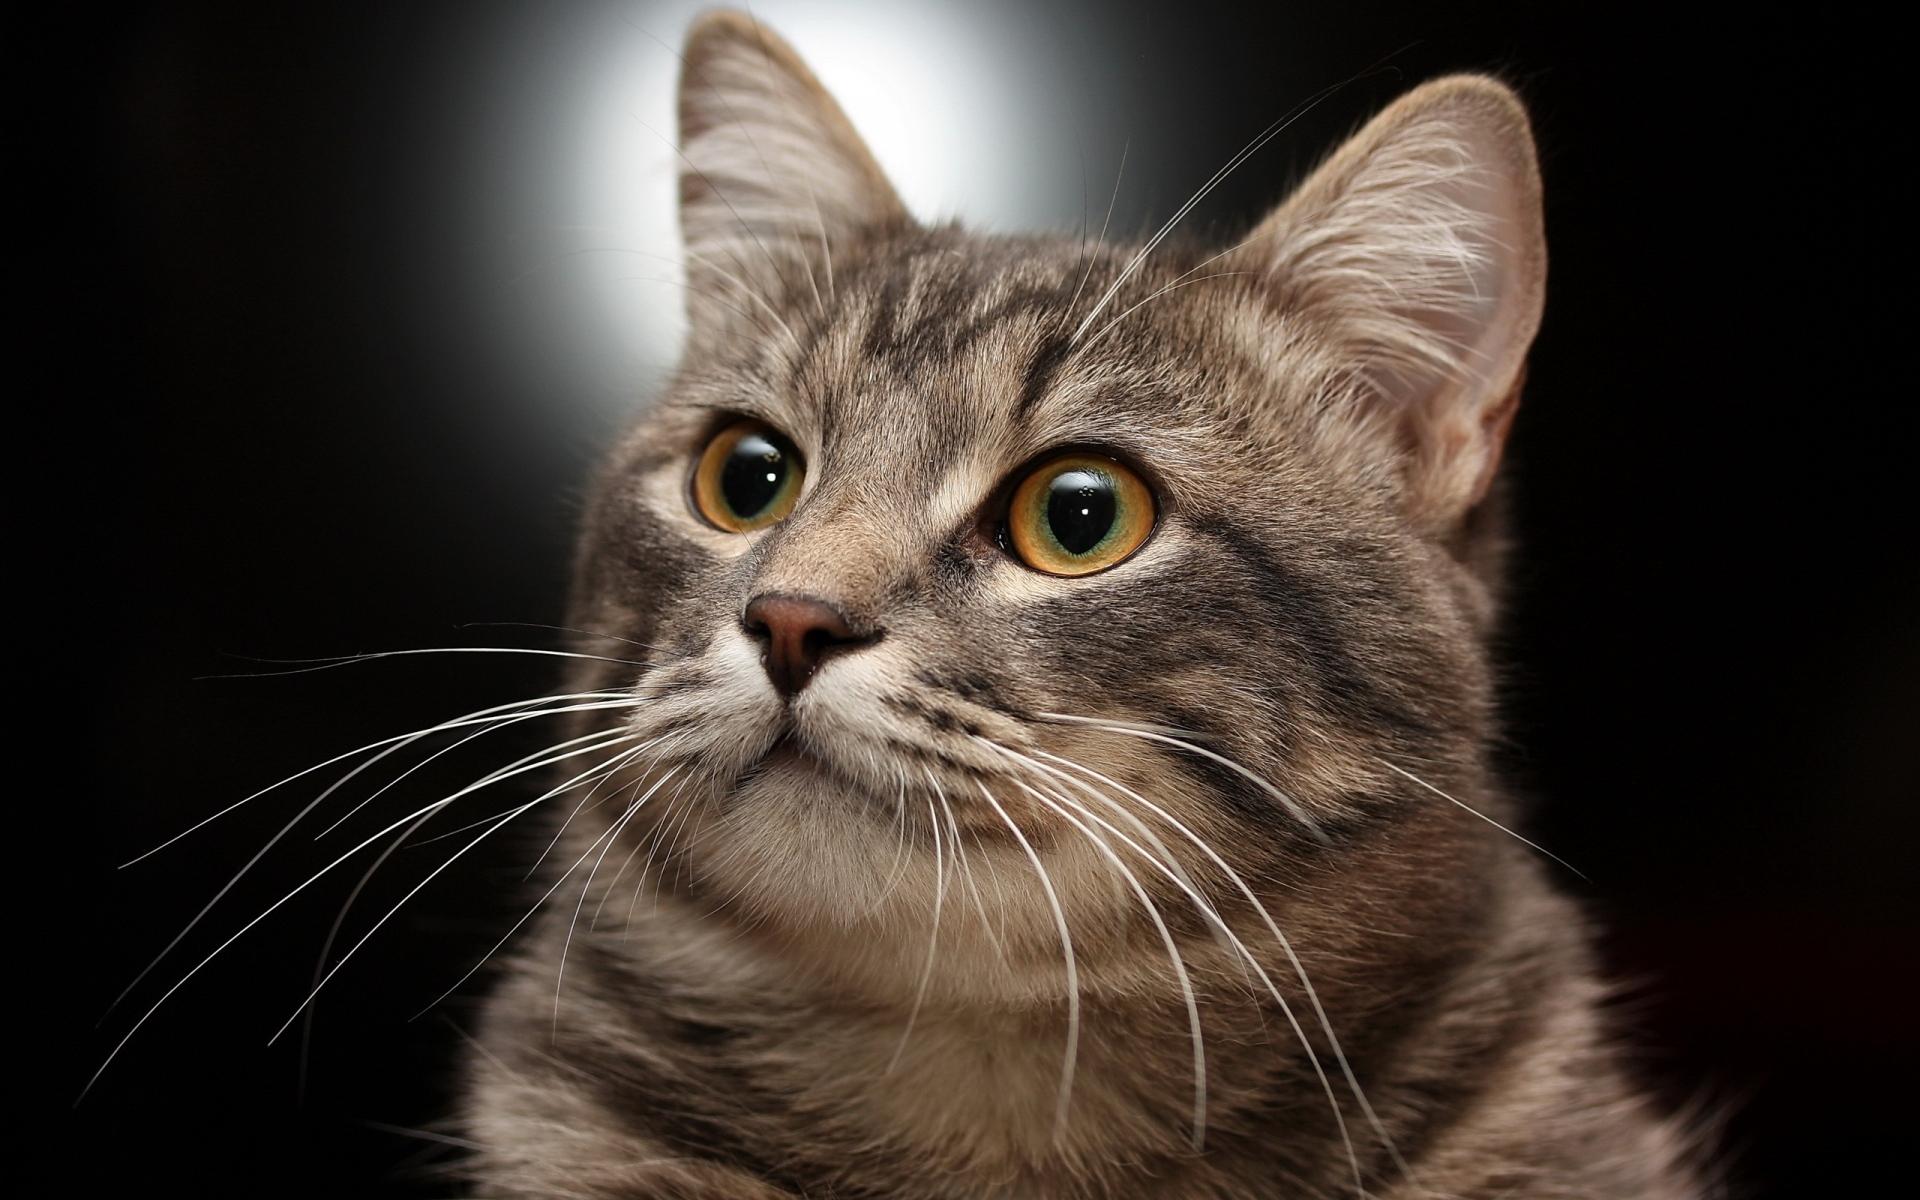 Картинки Кошка, морда, серый, полосатый фото и обои на рабочий стол